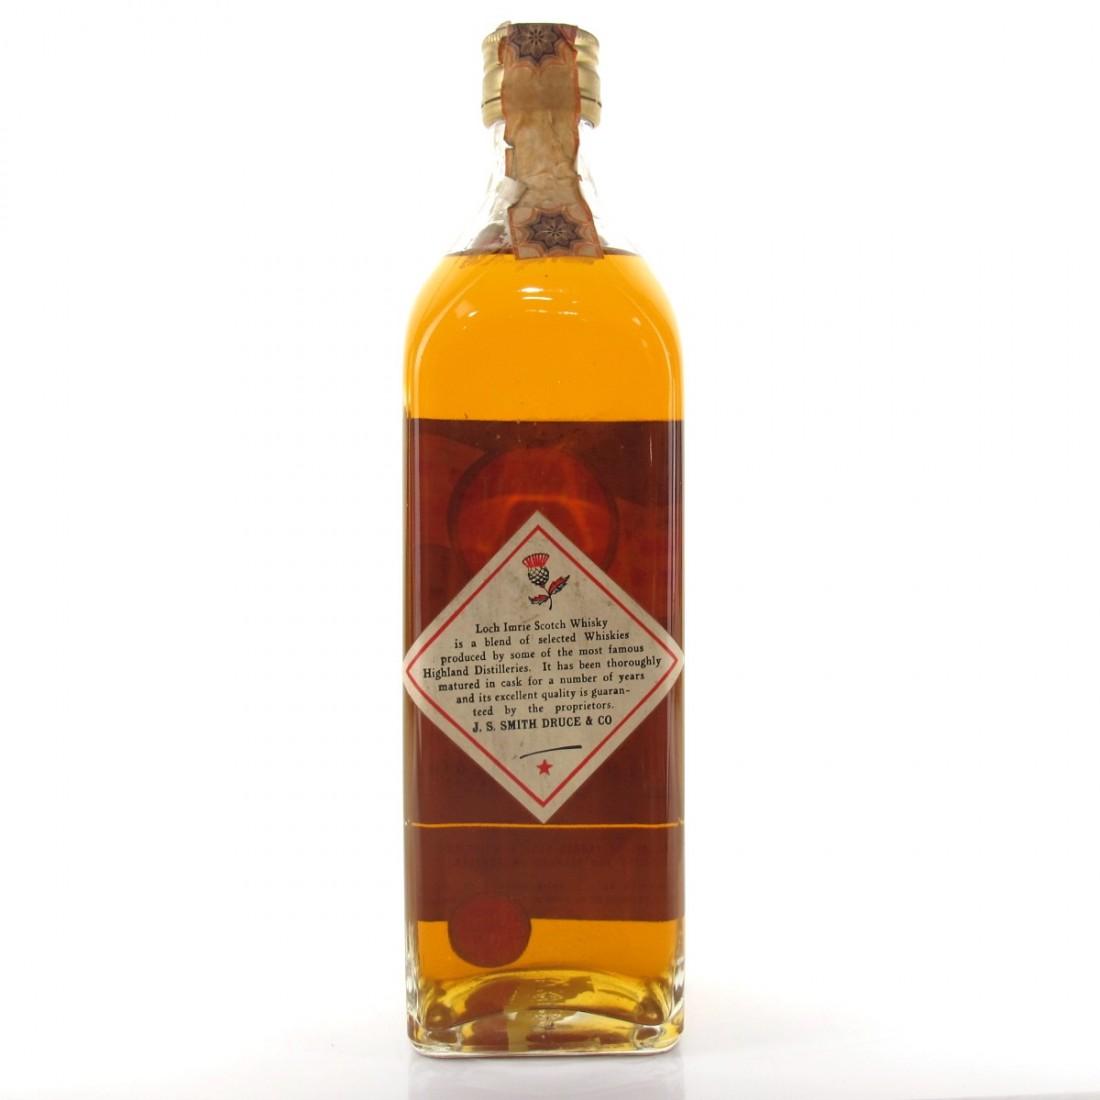 Loch Imrie Fine Old Scotch Whisky 1960s